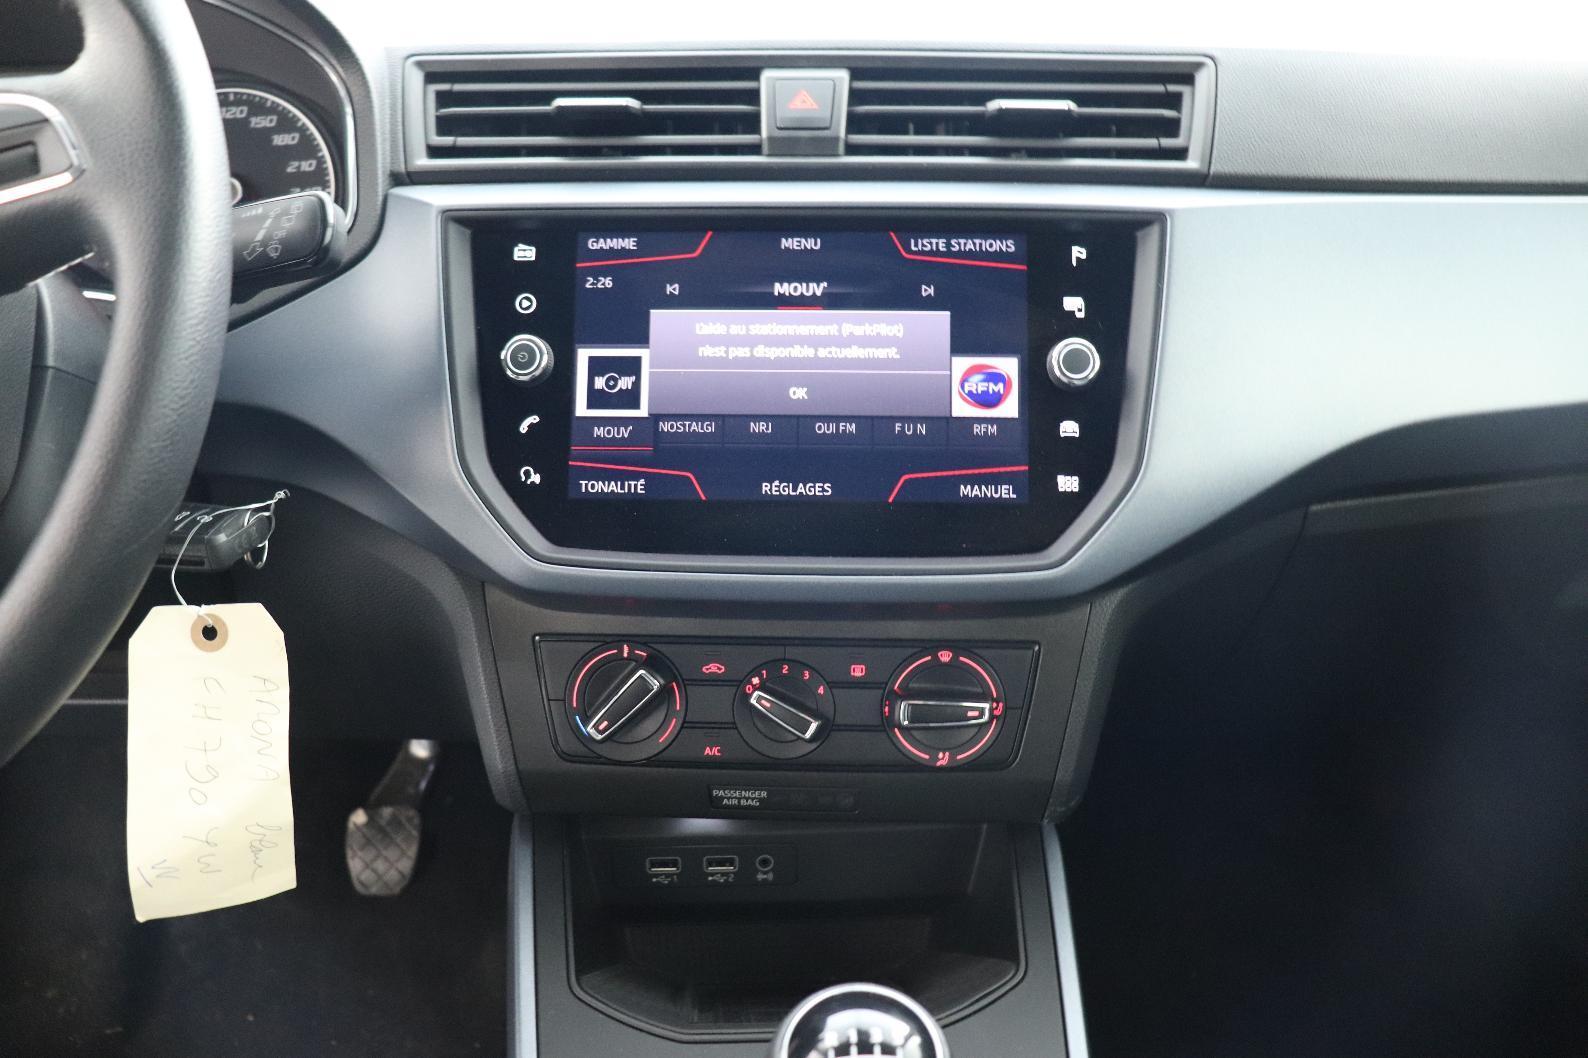 SEAT Arona 1.0 EcoTSI 95 ch Start/Stop BVM5 Xcellence